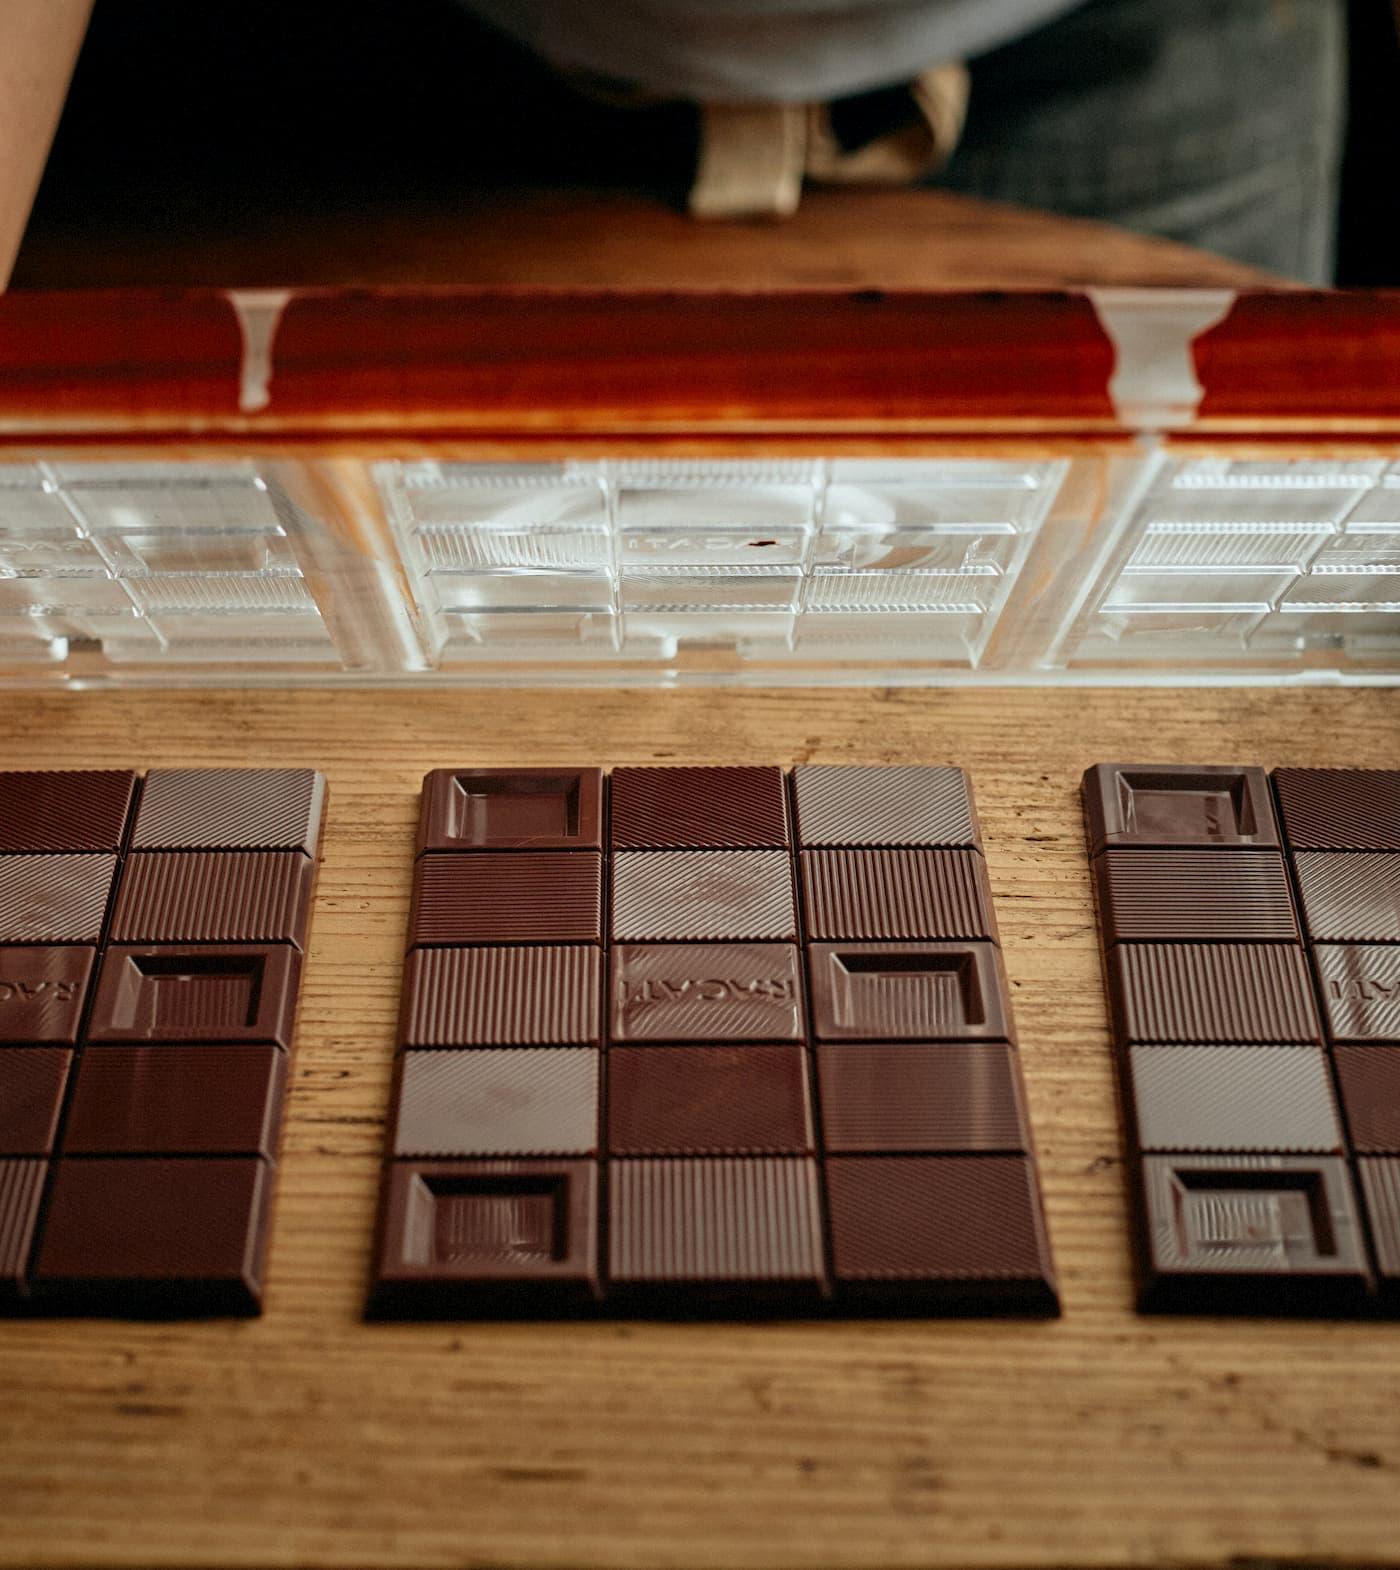 RACATIのチョコレート梱包